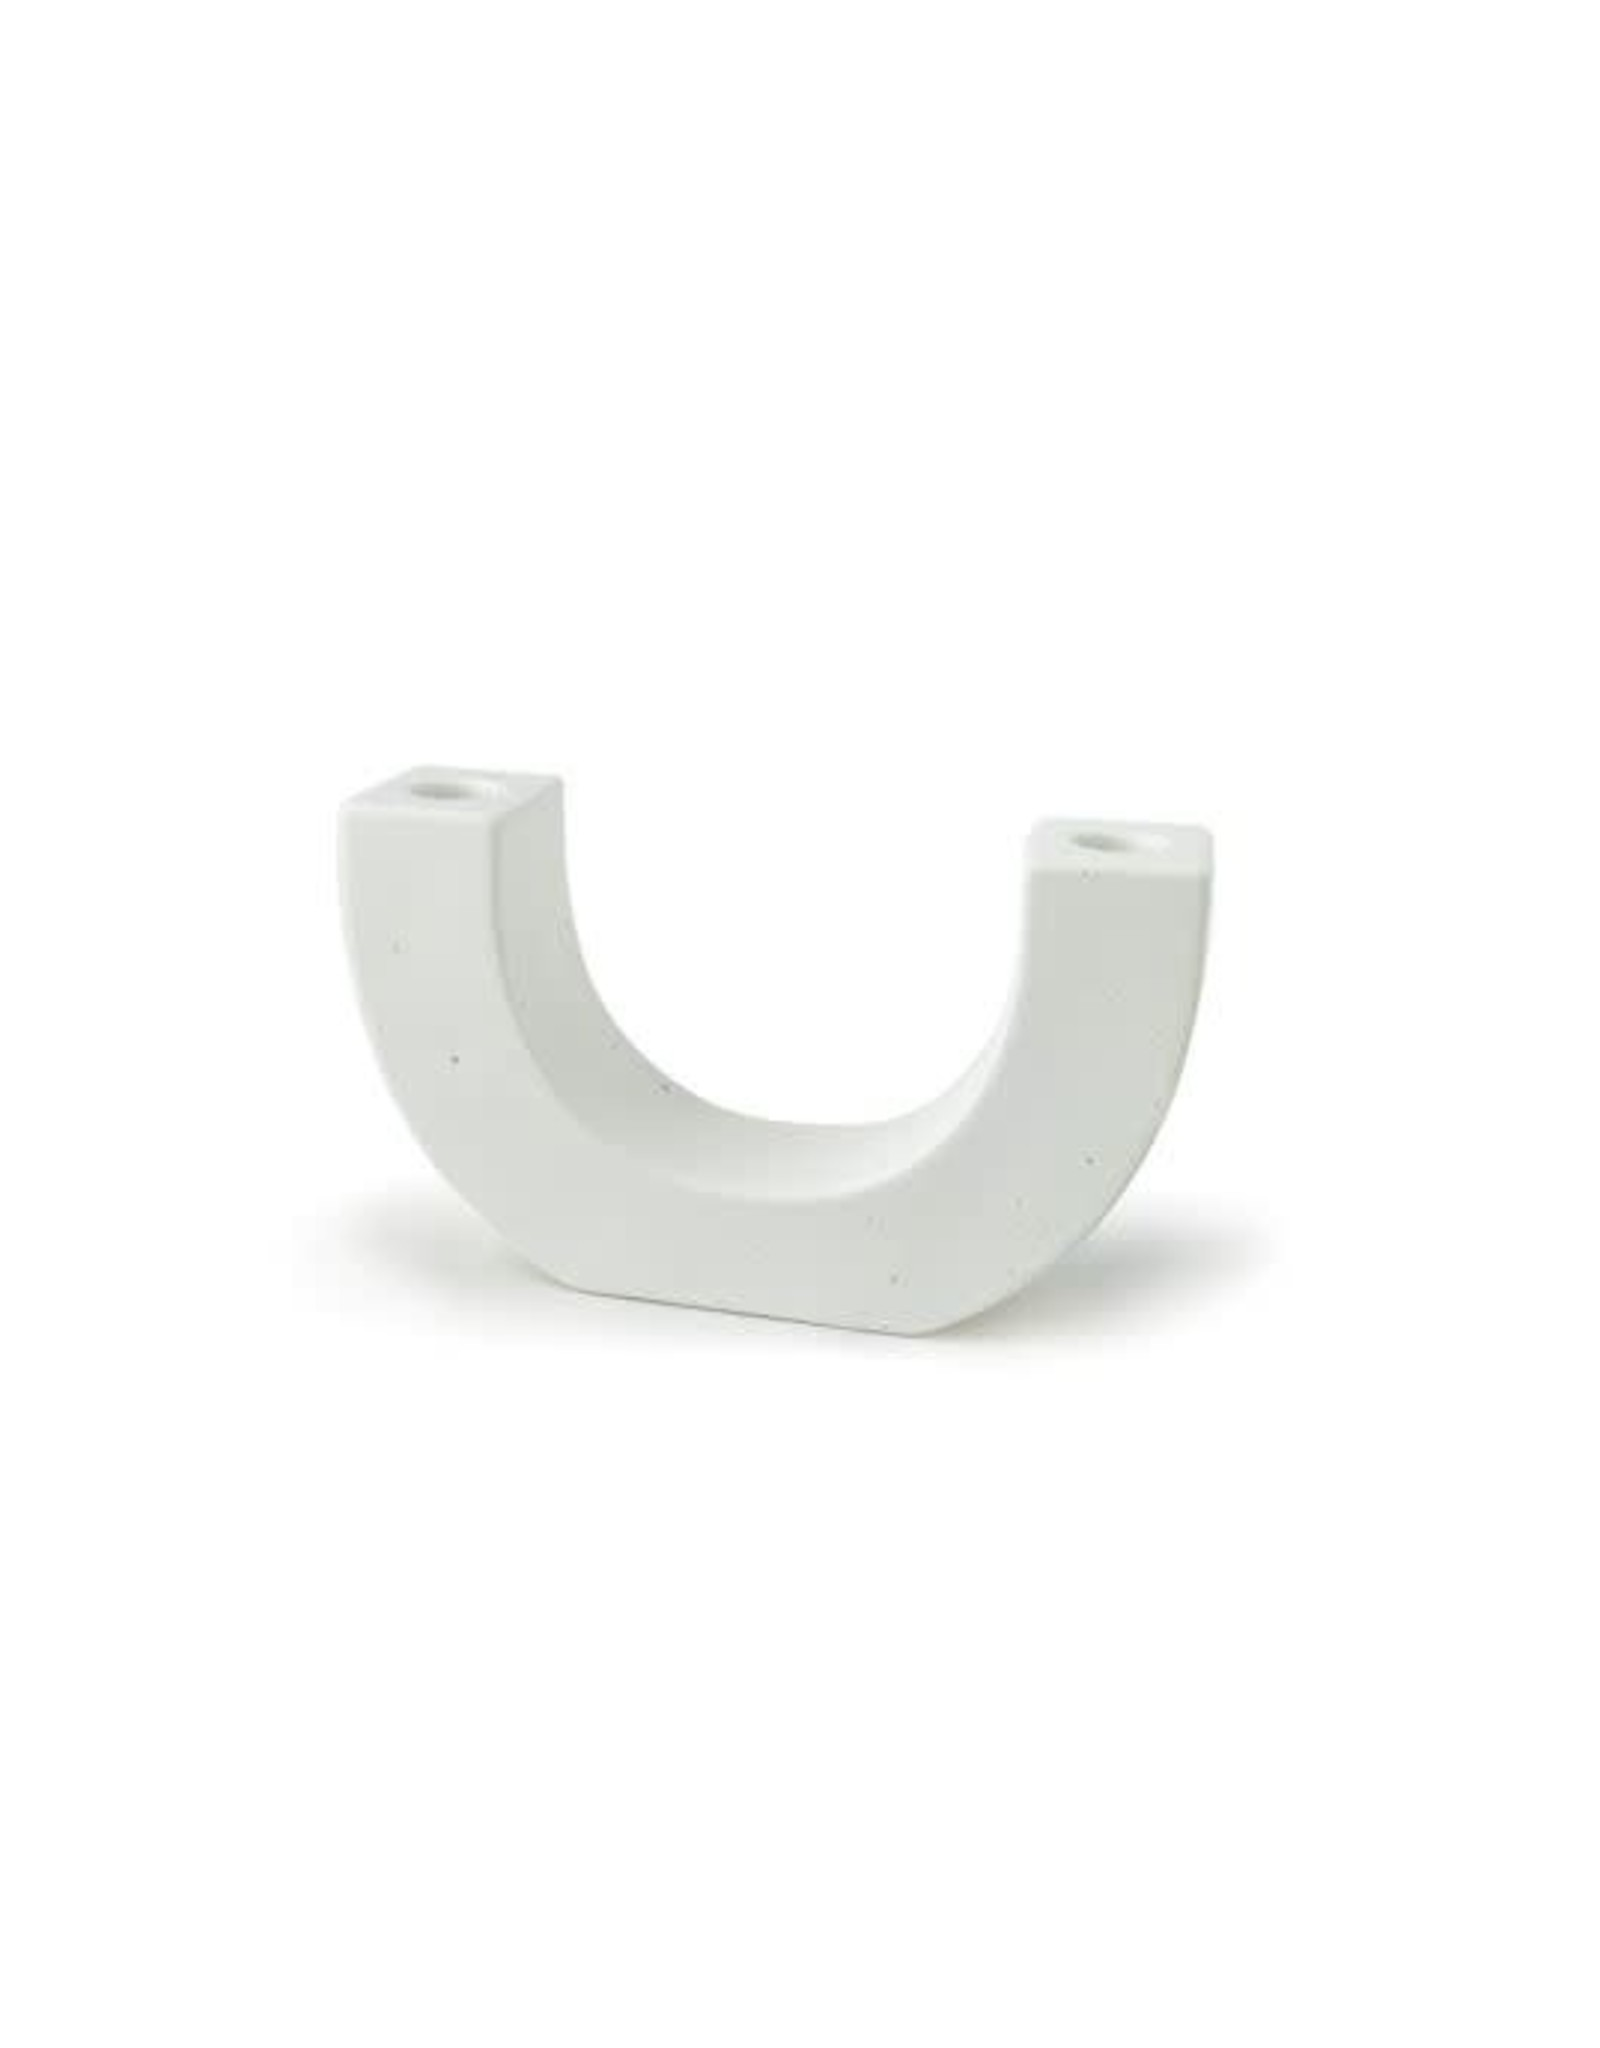 White Speckled U-Shaped Ceramic Taper Holder